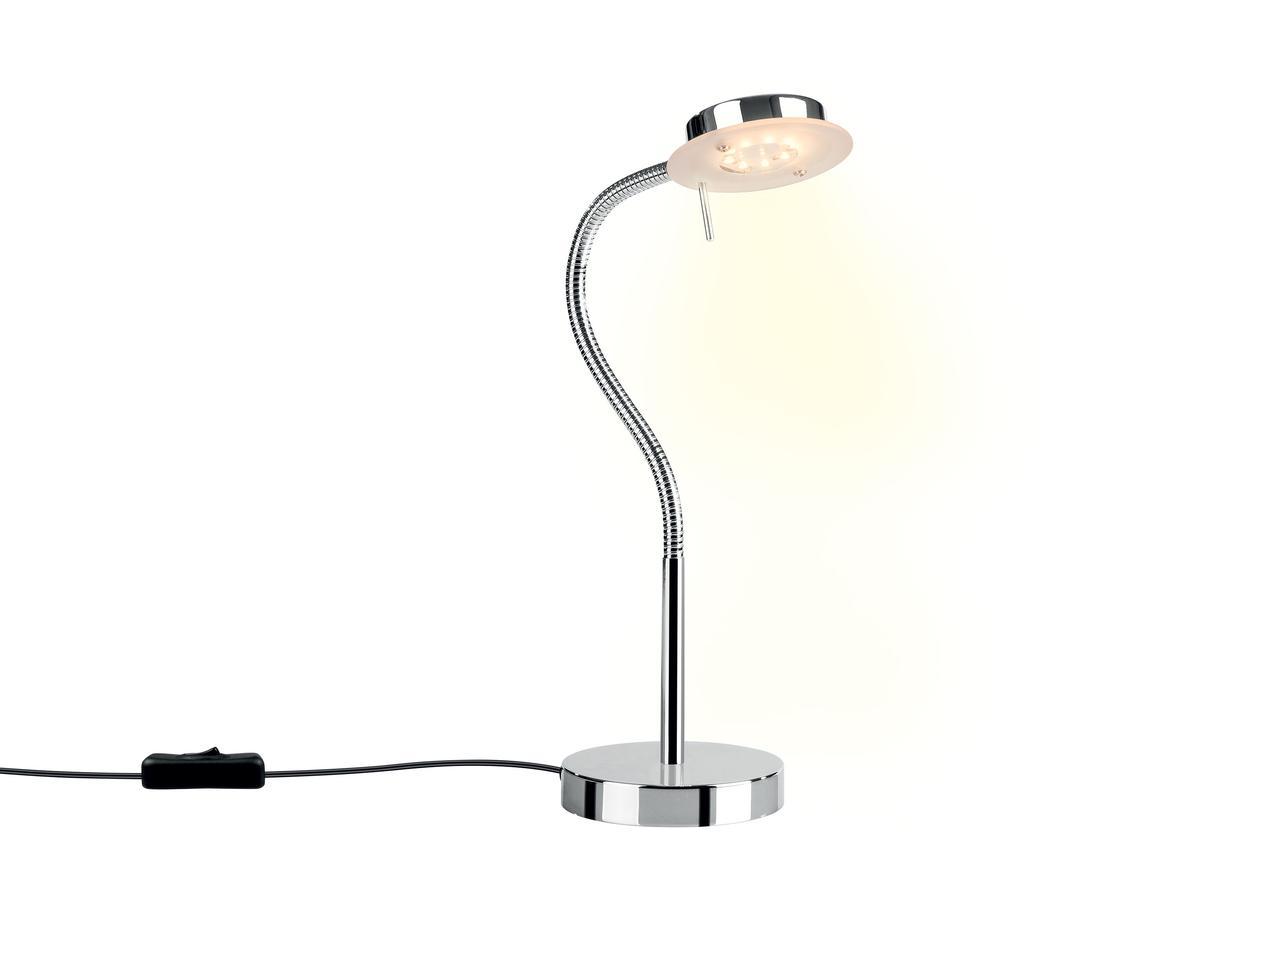 Lampada da tavolo led lidl u italia archivio offerte promozionali